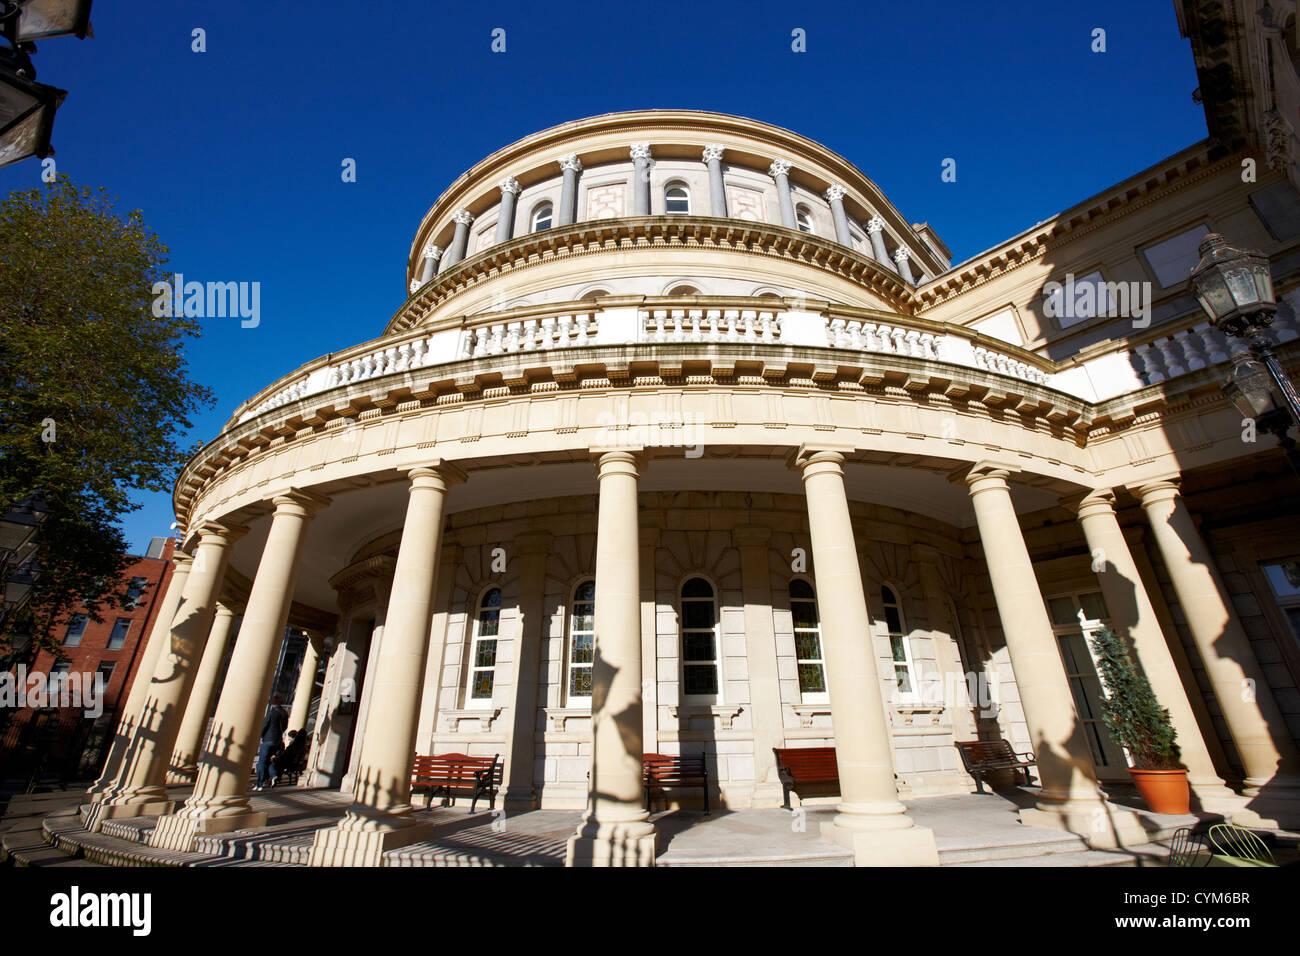 the national library of ireland dublin republic of ireland - Stock Image